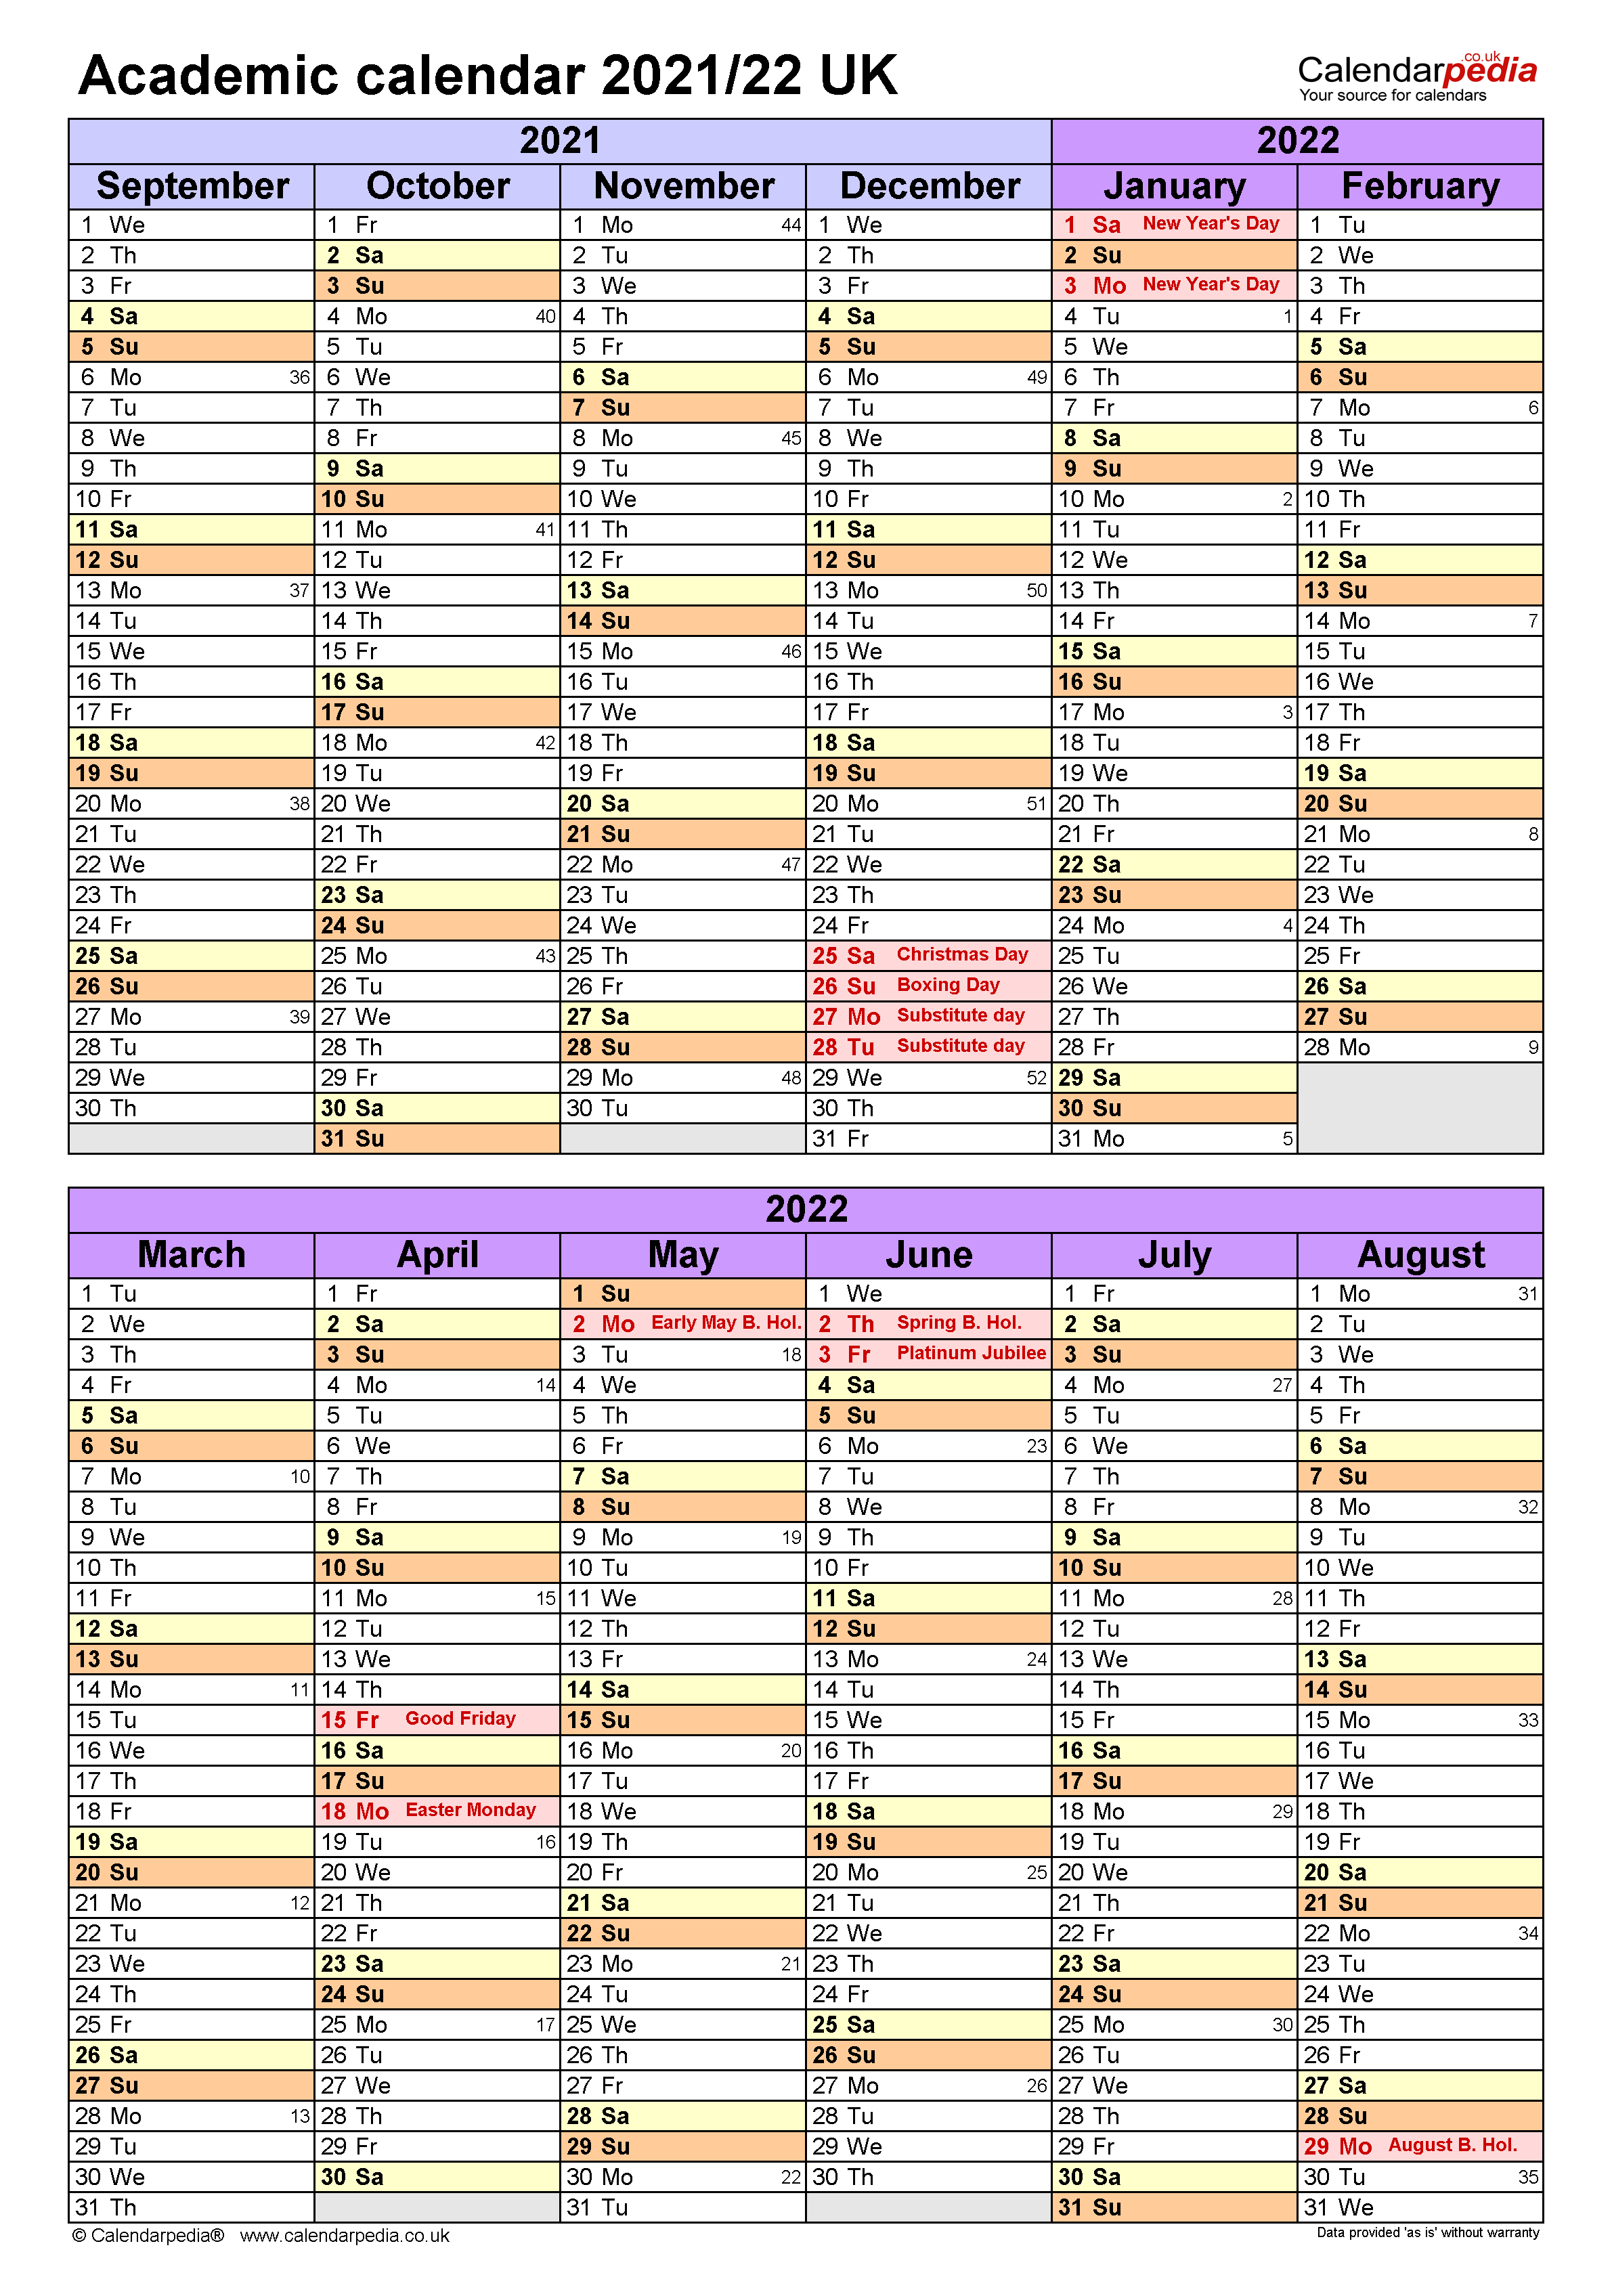 Academic calendars 2021/2022 - free printable PDF templates